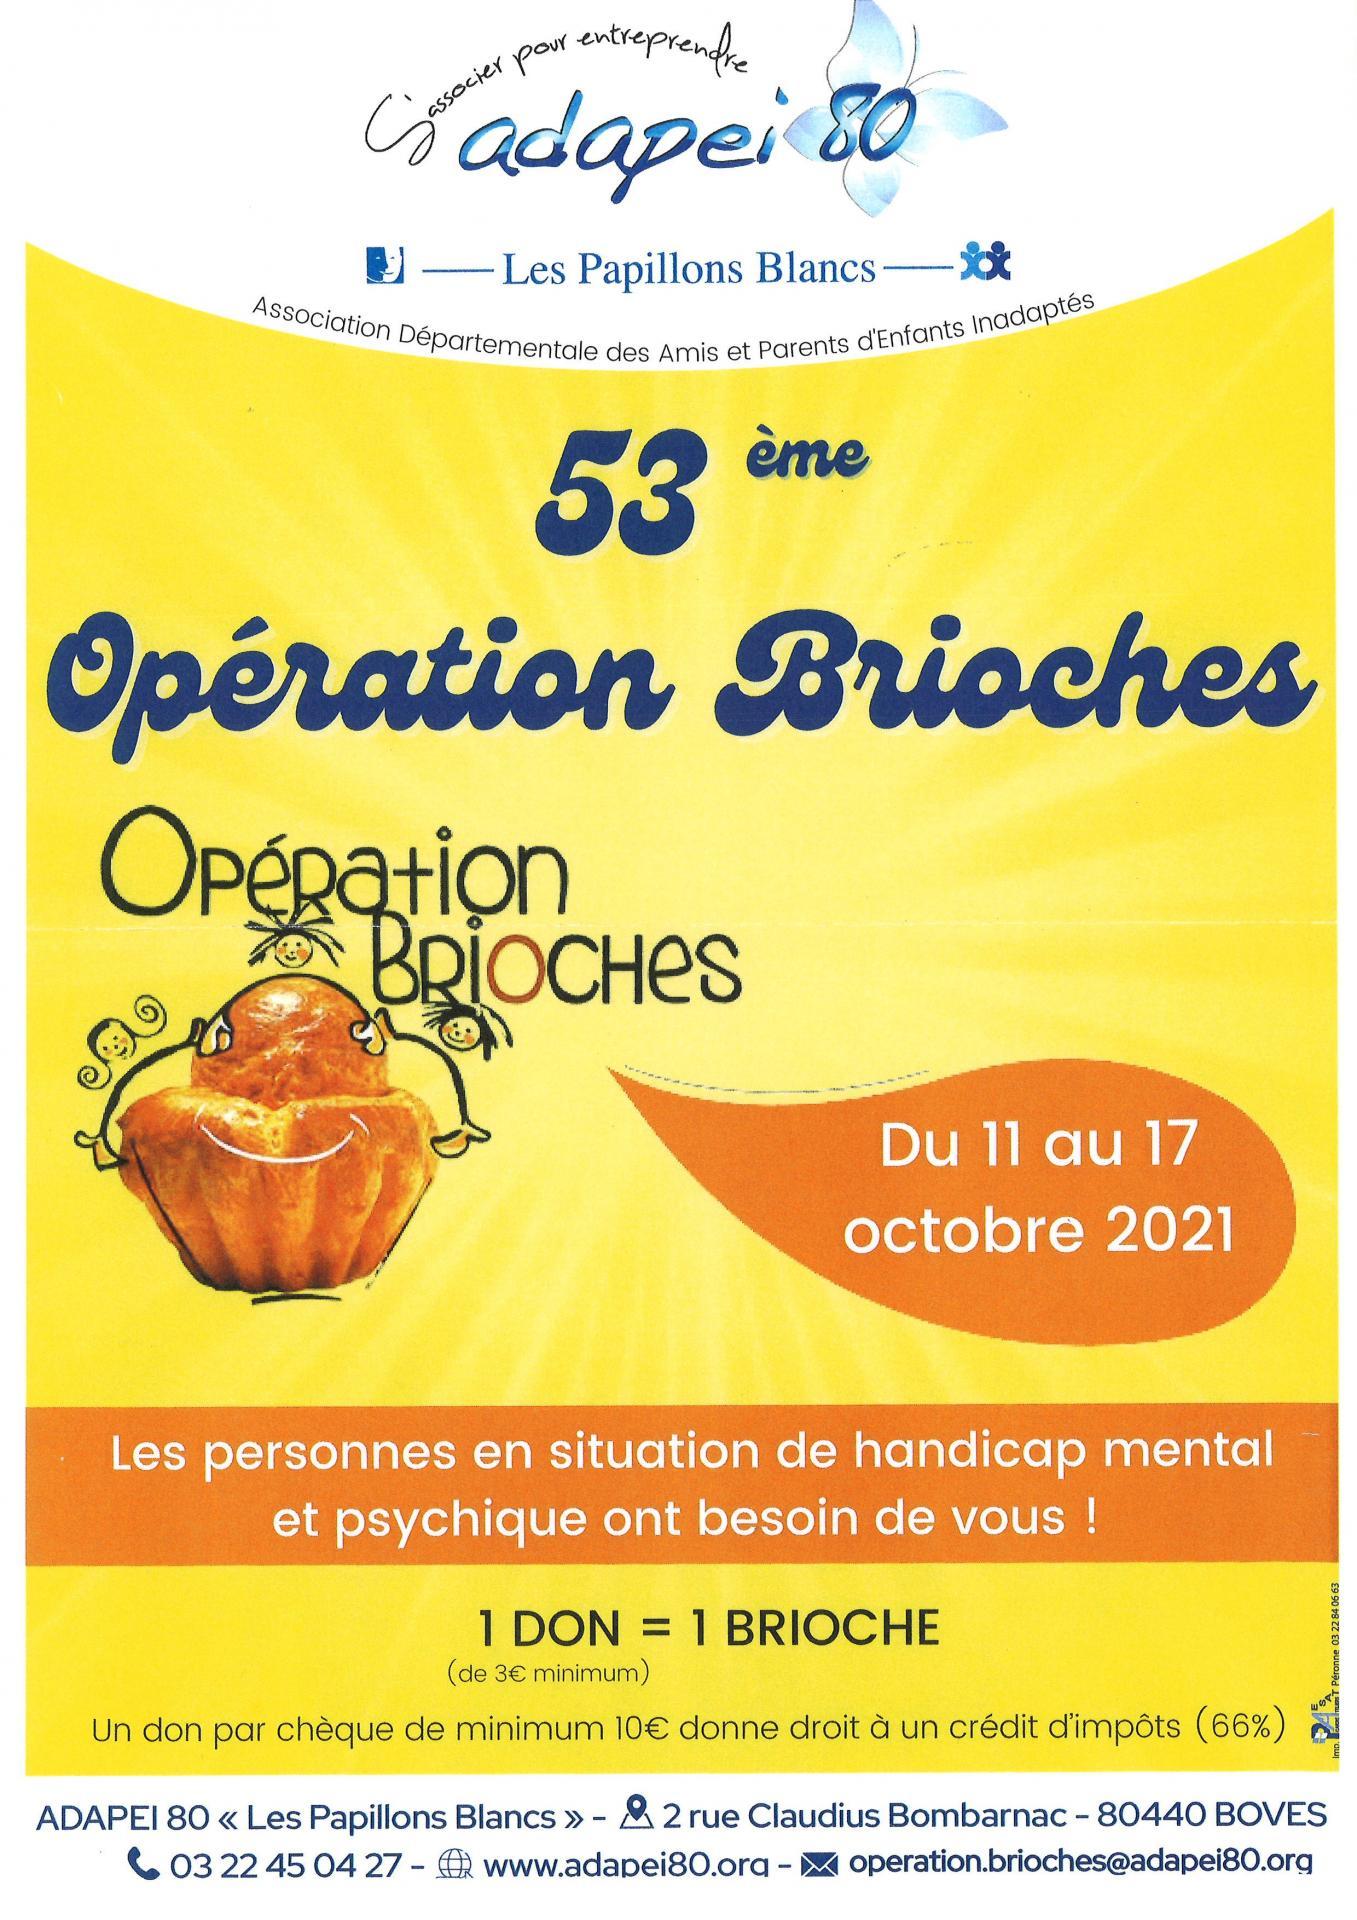 Opérations brioches 2021